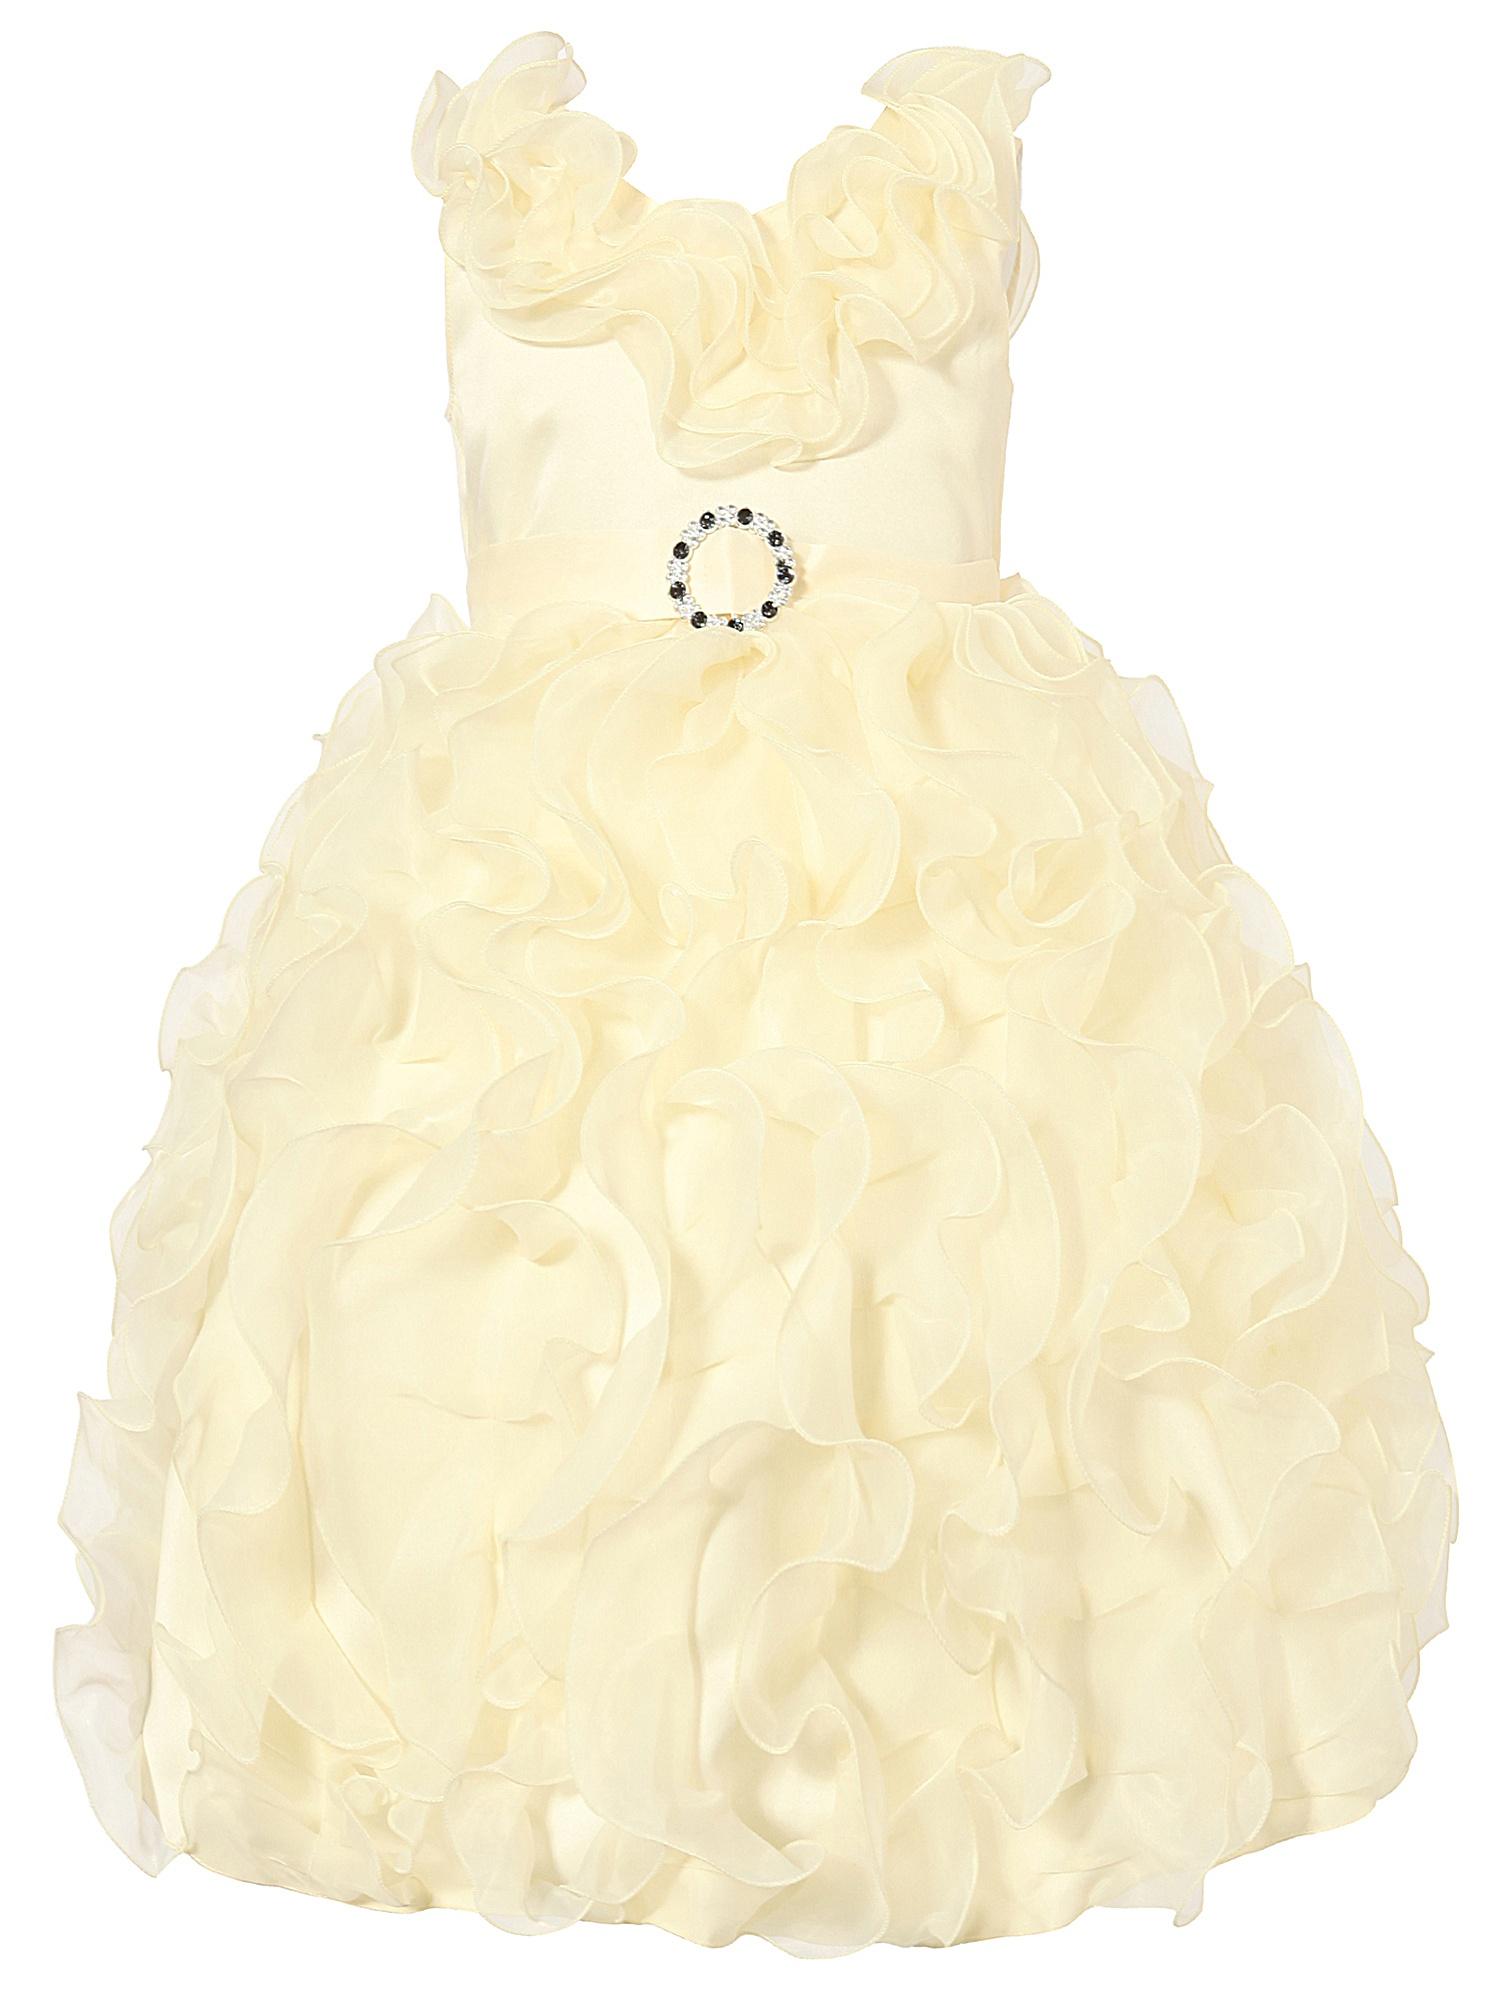 Richie House Little Girls Coral Cascade Ruffle Bridal Dress 3/4